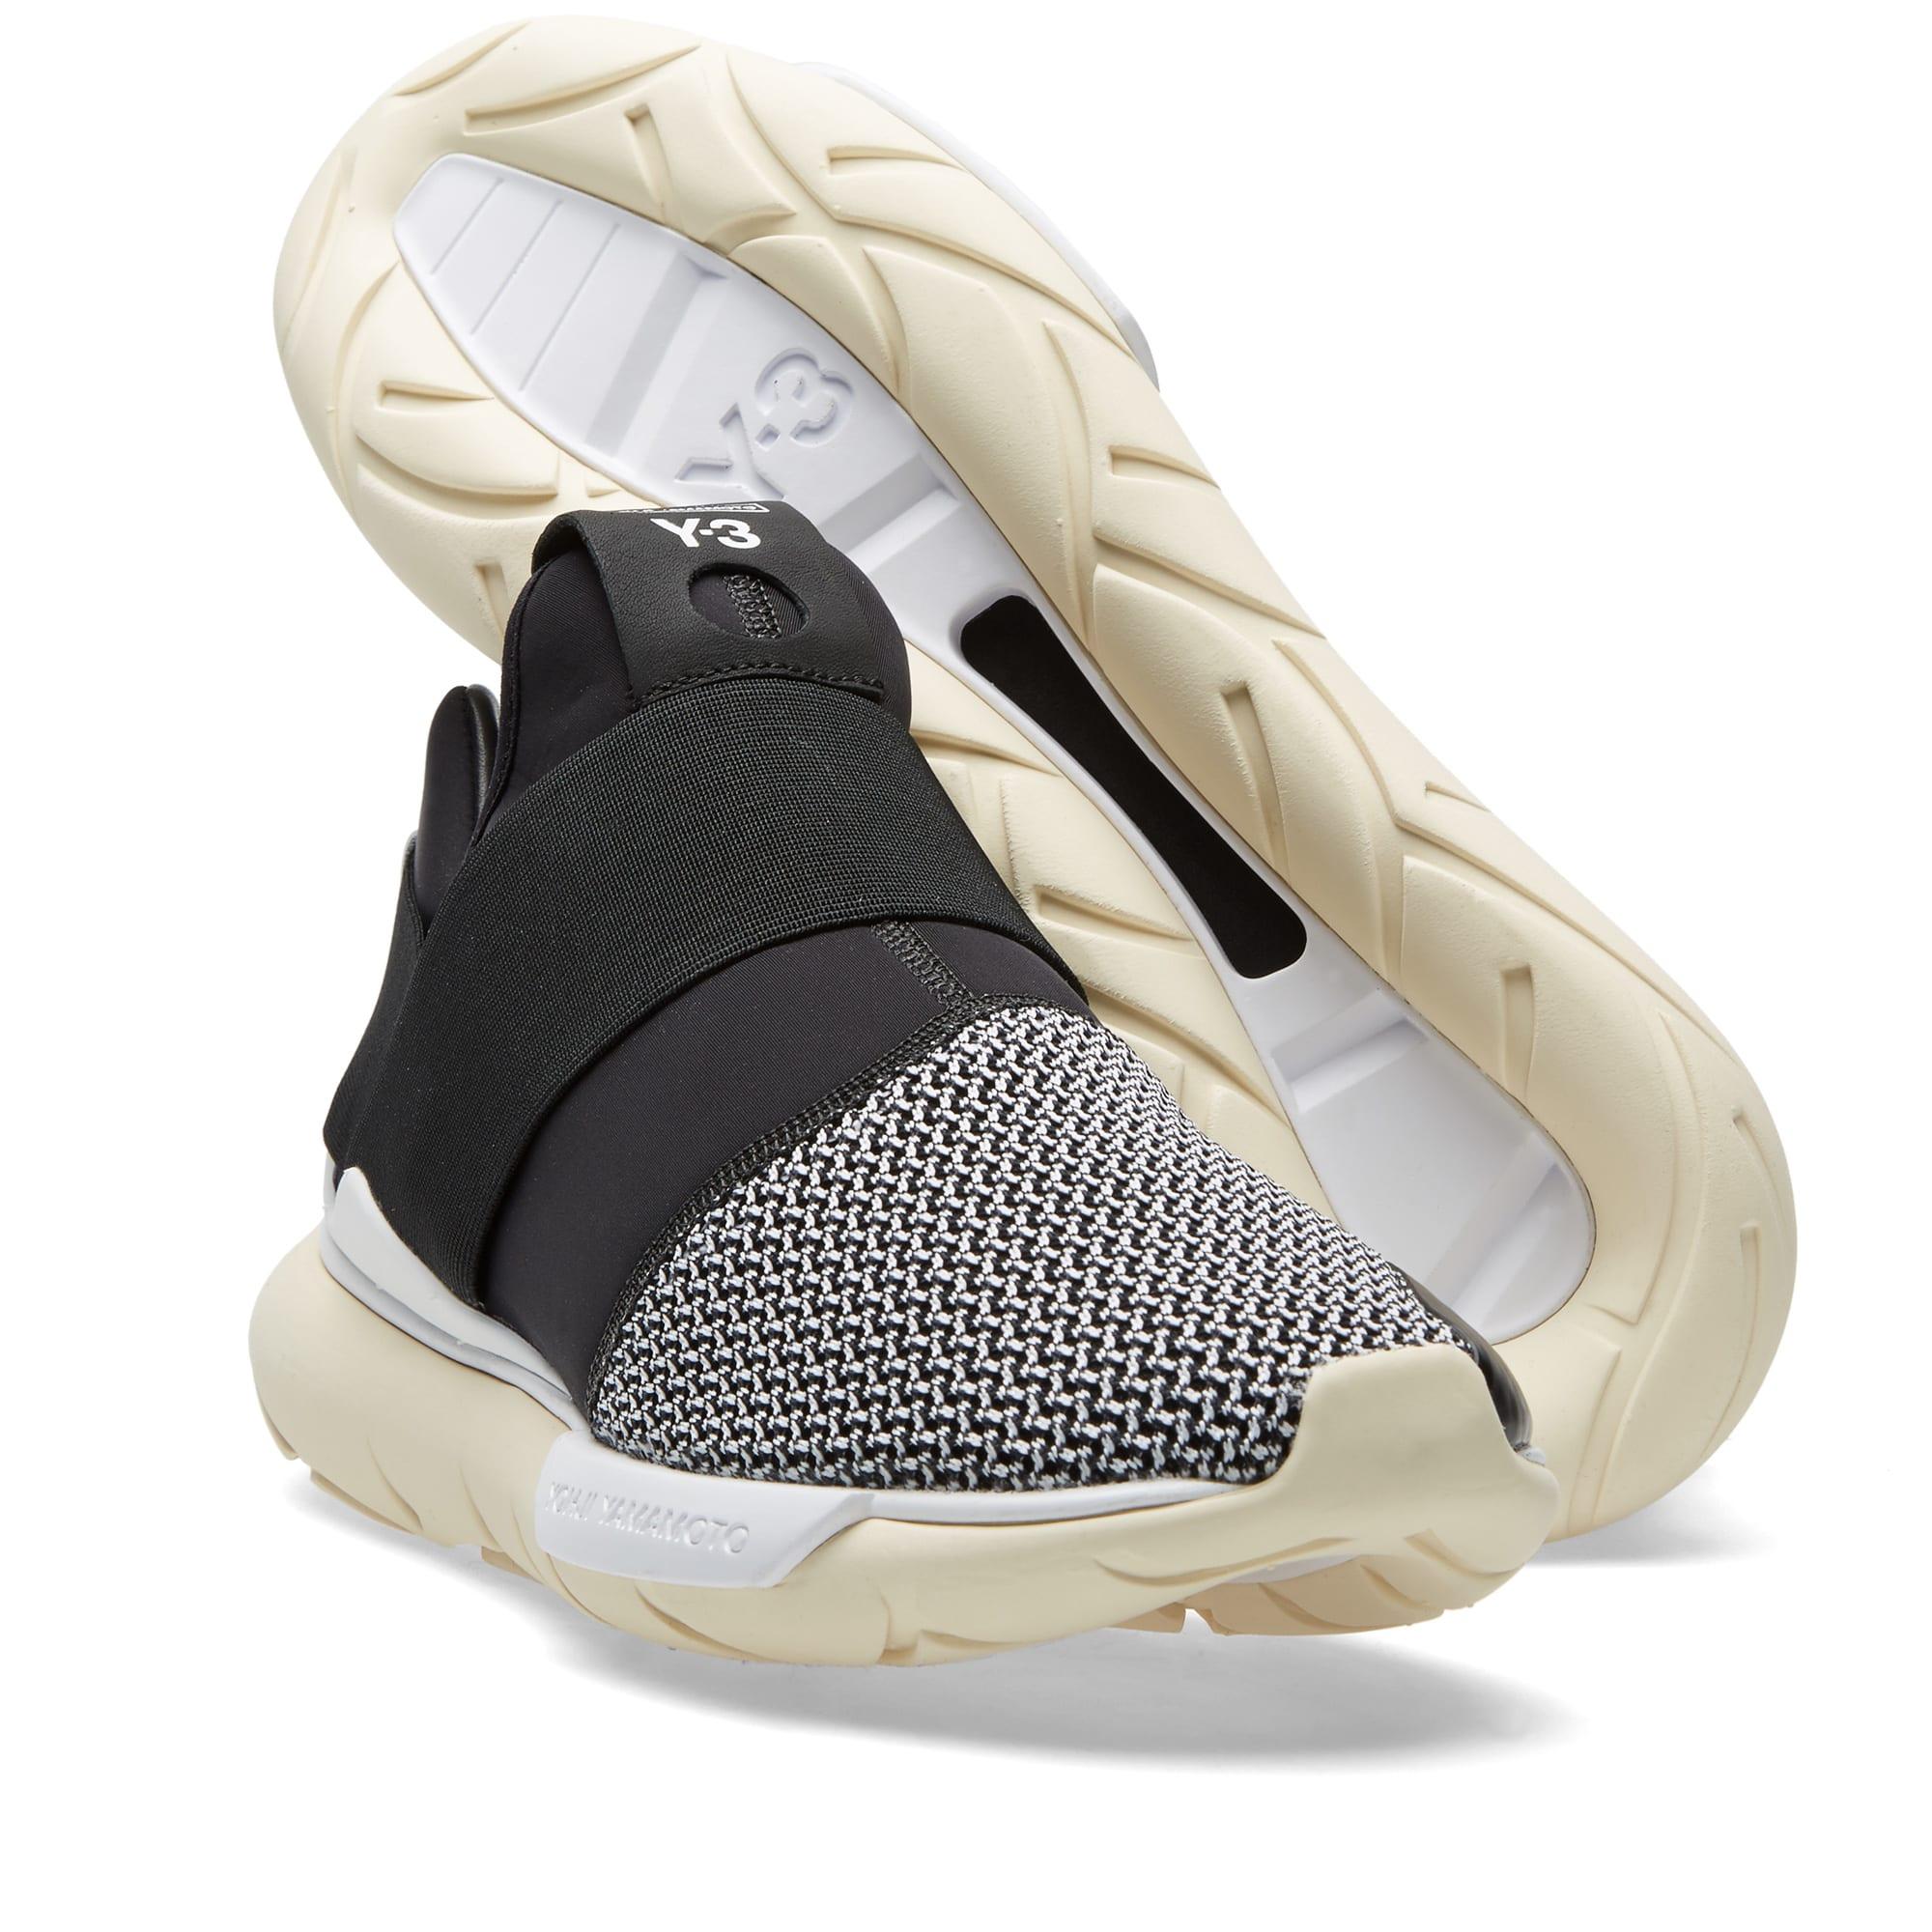 new concept e23d6 c5504 Y-3 Qasa Low II Primeknit Black, Cream   White   END.